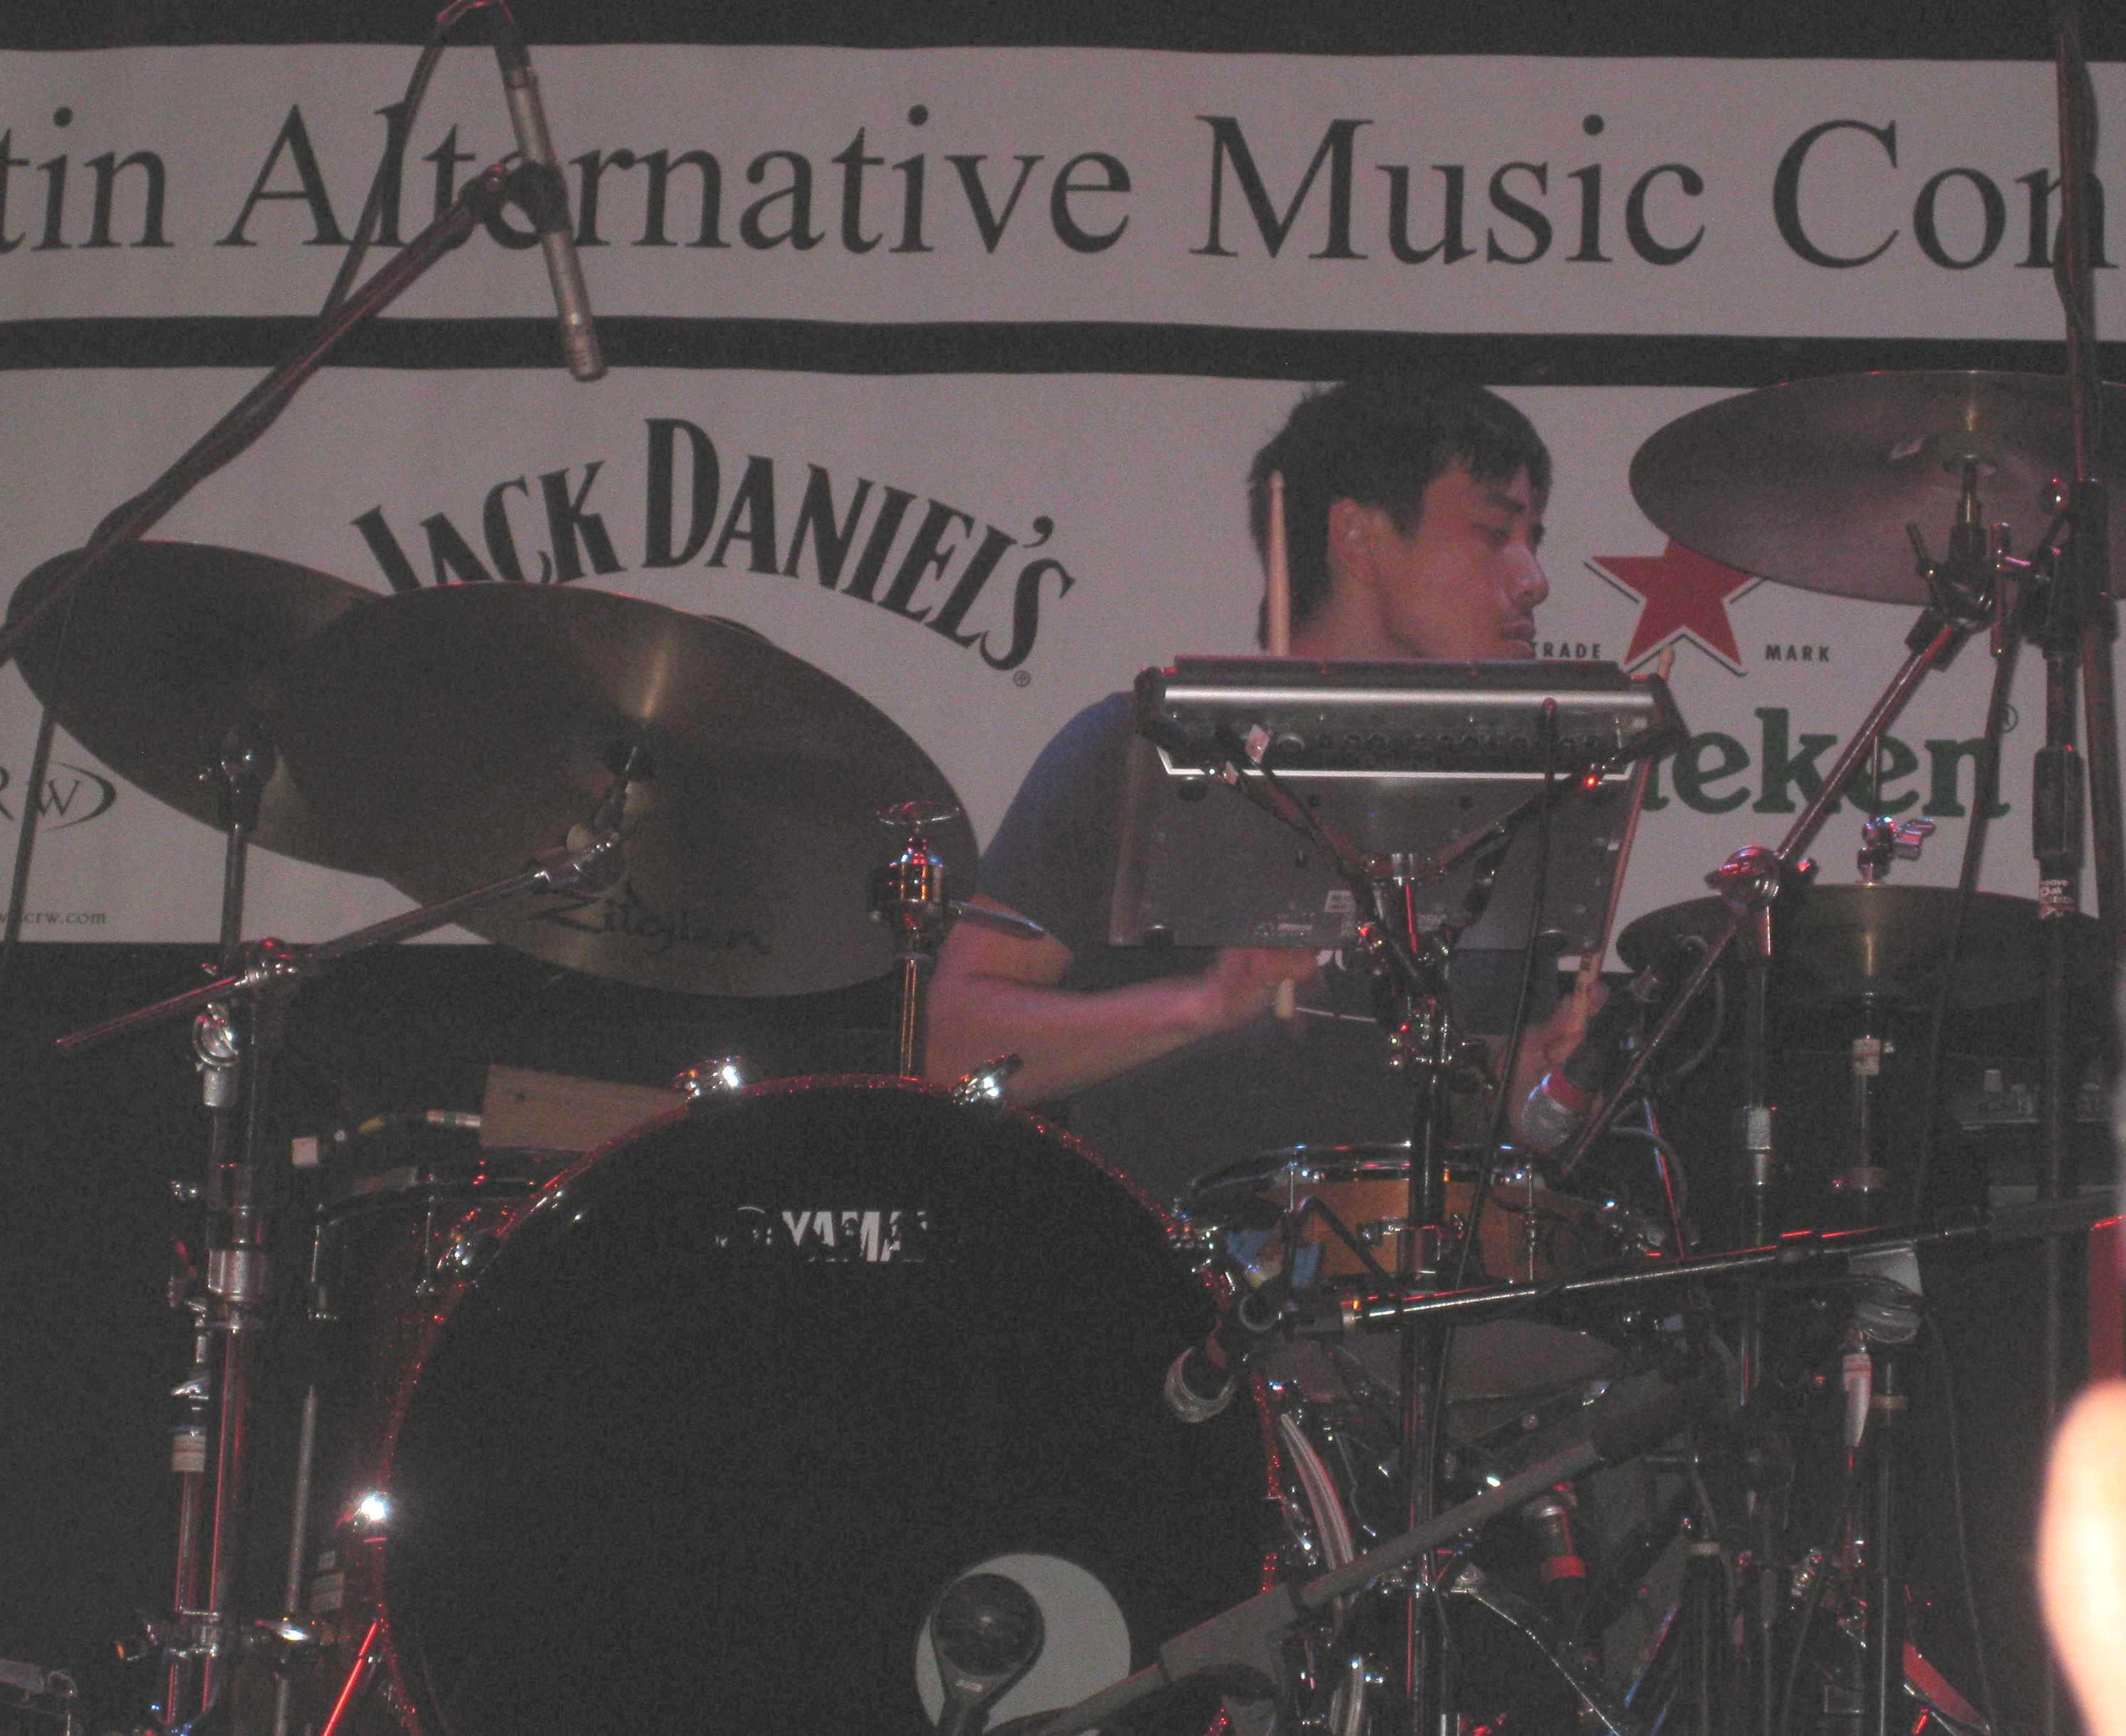 File:Alex Wong Drum Kit jpg - Wikimedia Commons